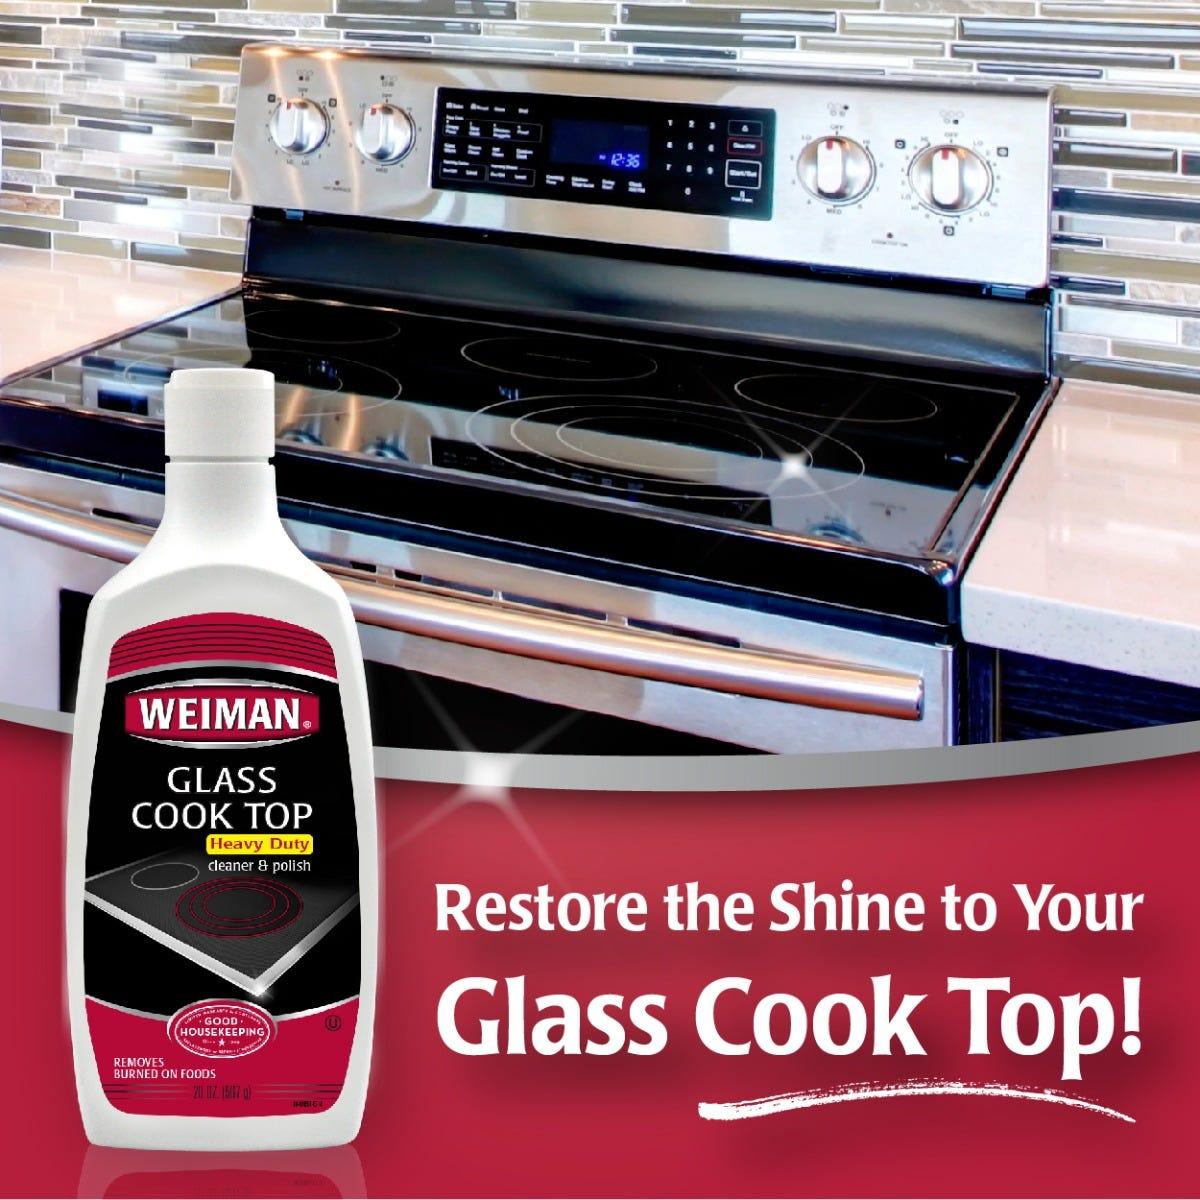 https://googone.com/media/catalog/product/w/e/weiman_glass_cooktop_cleaner_01.jpg